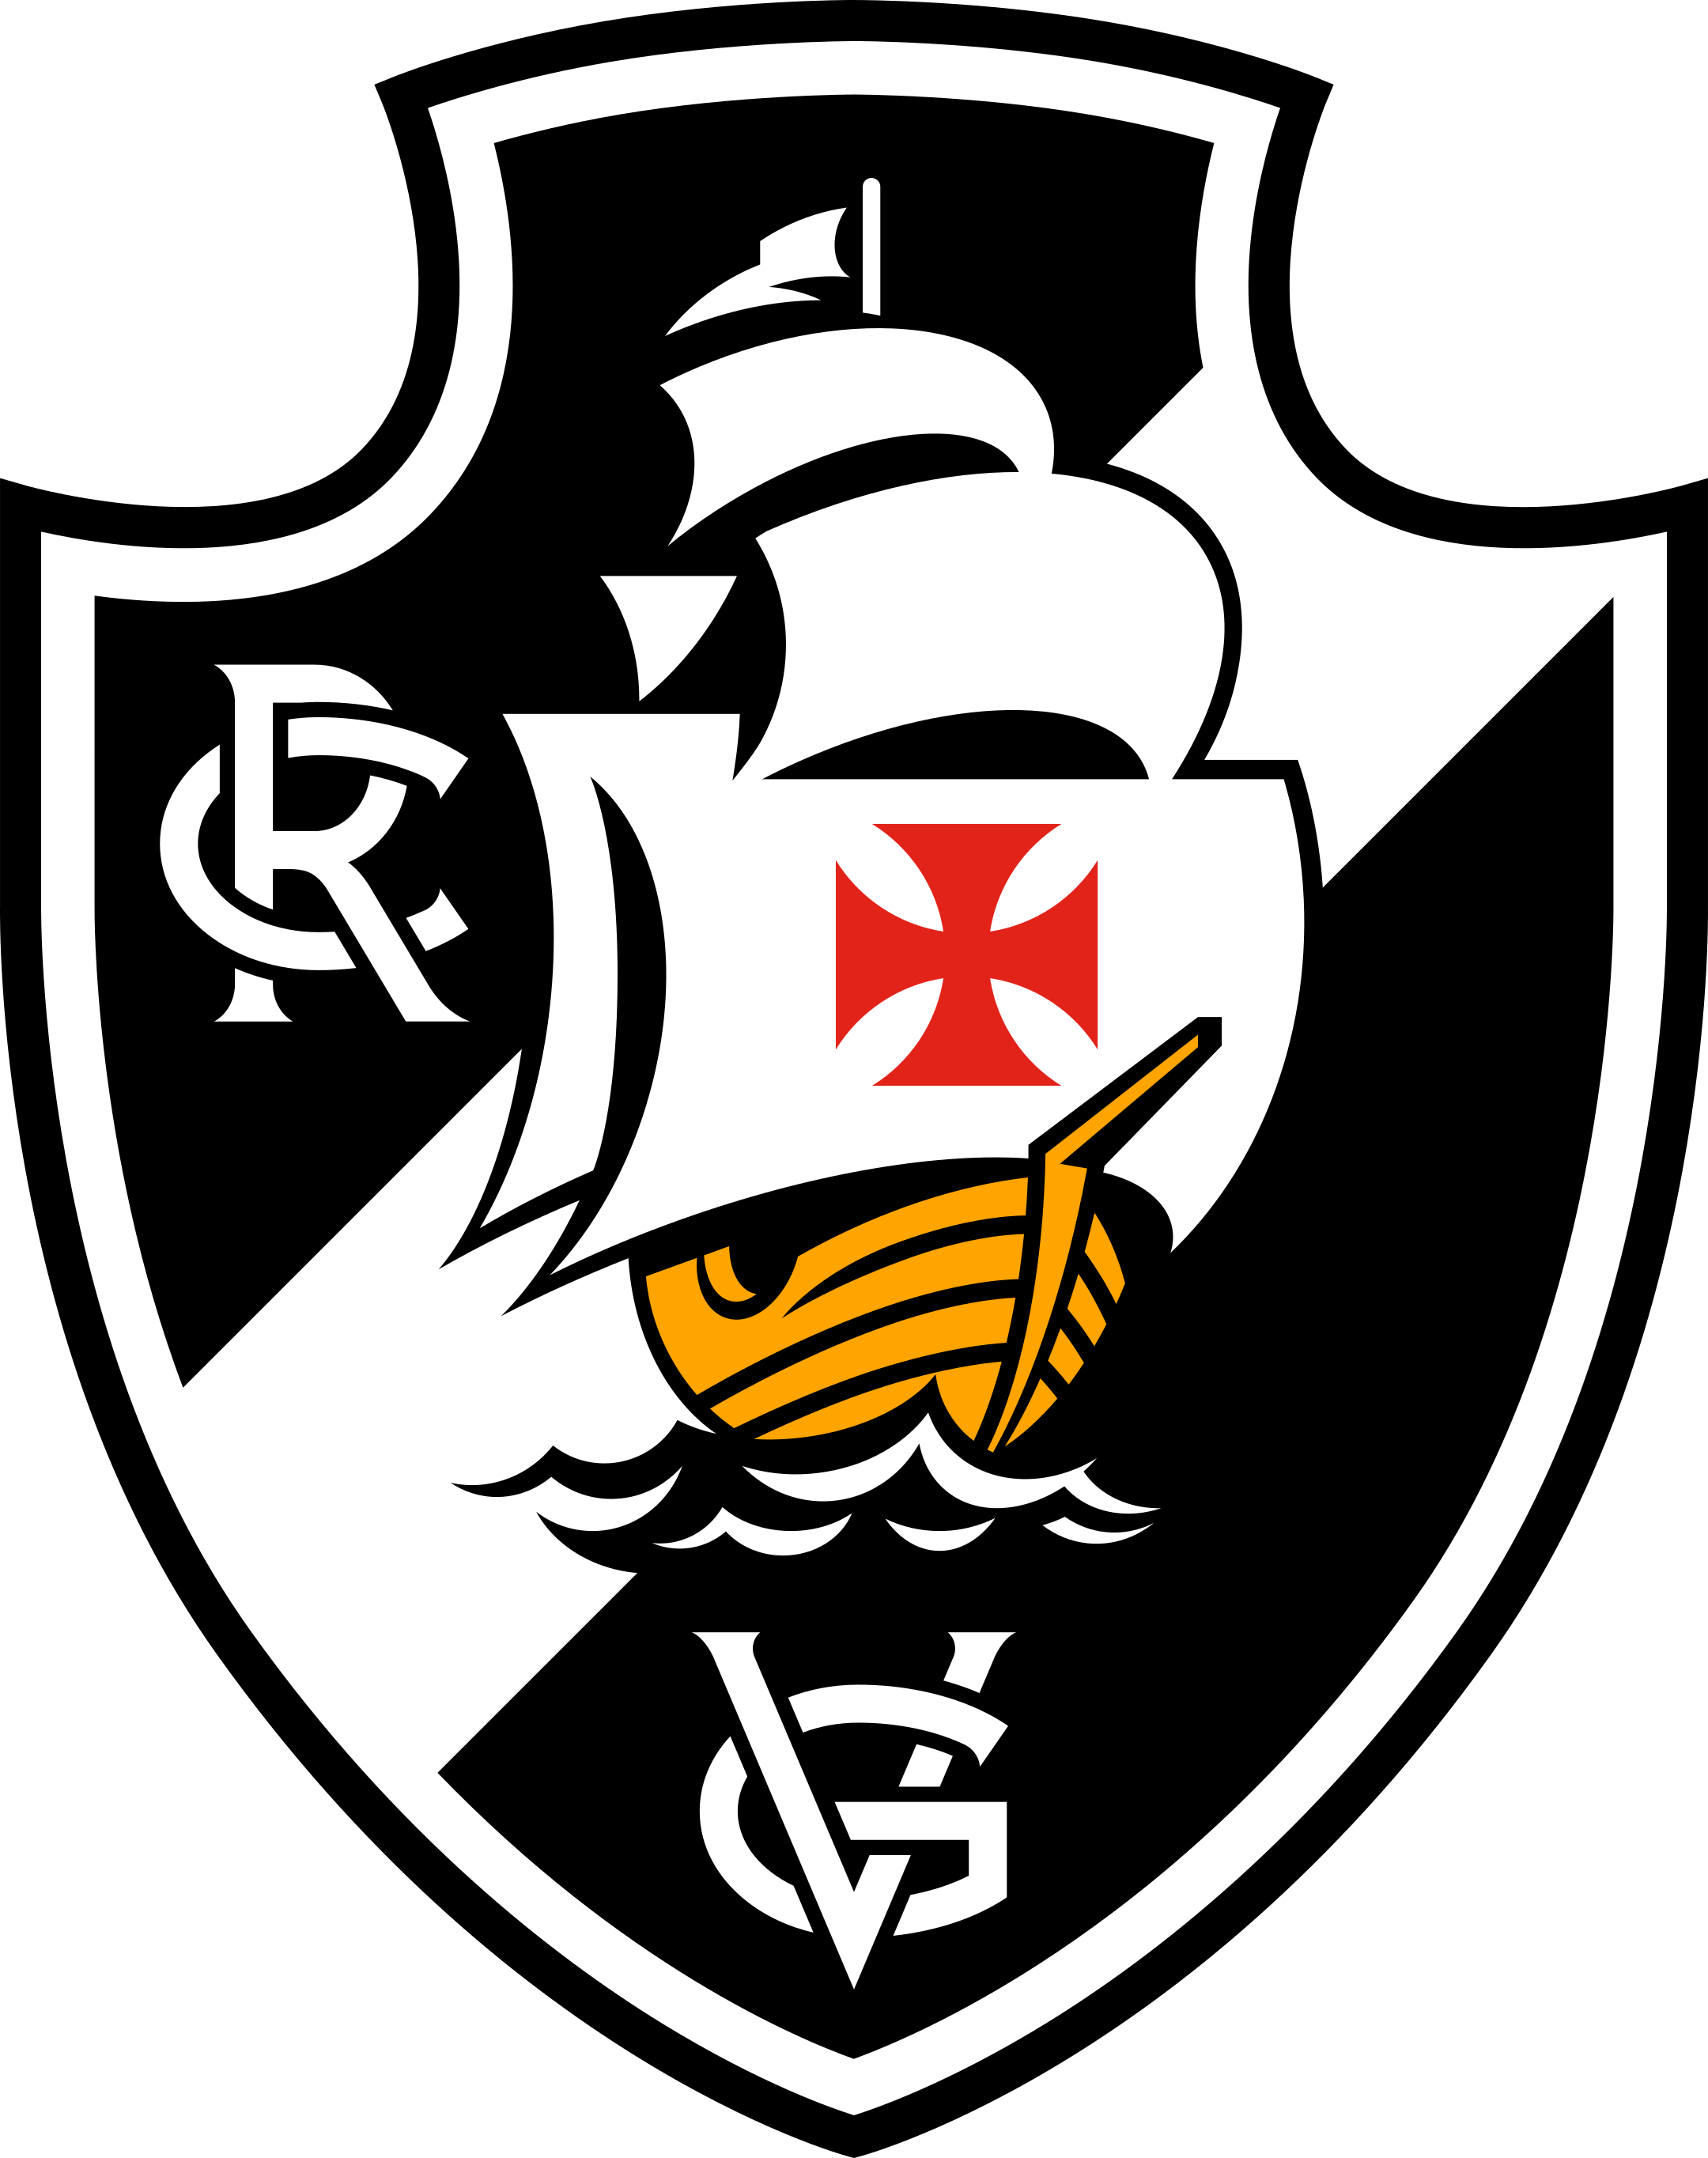 vasco logo 1 - Vasco da Gama Logo - Escudo